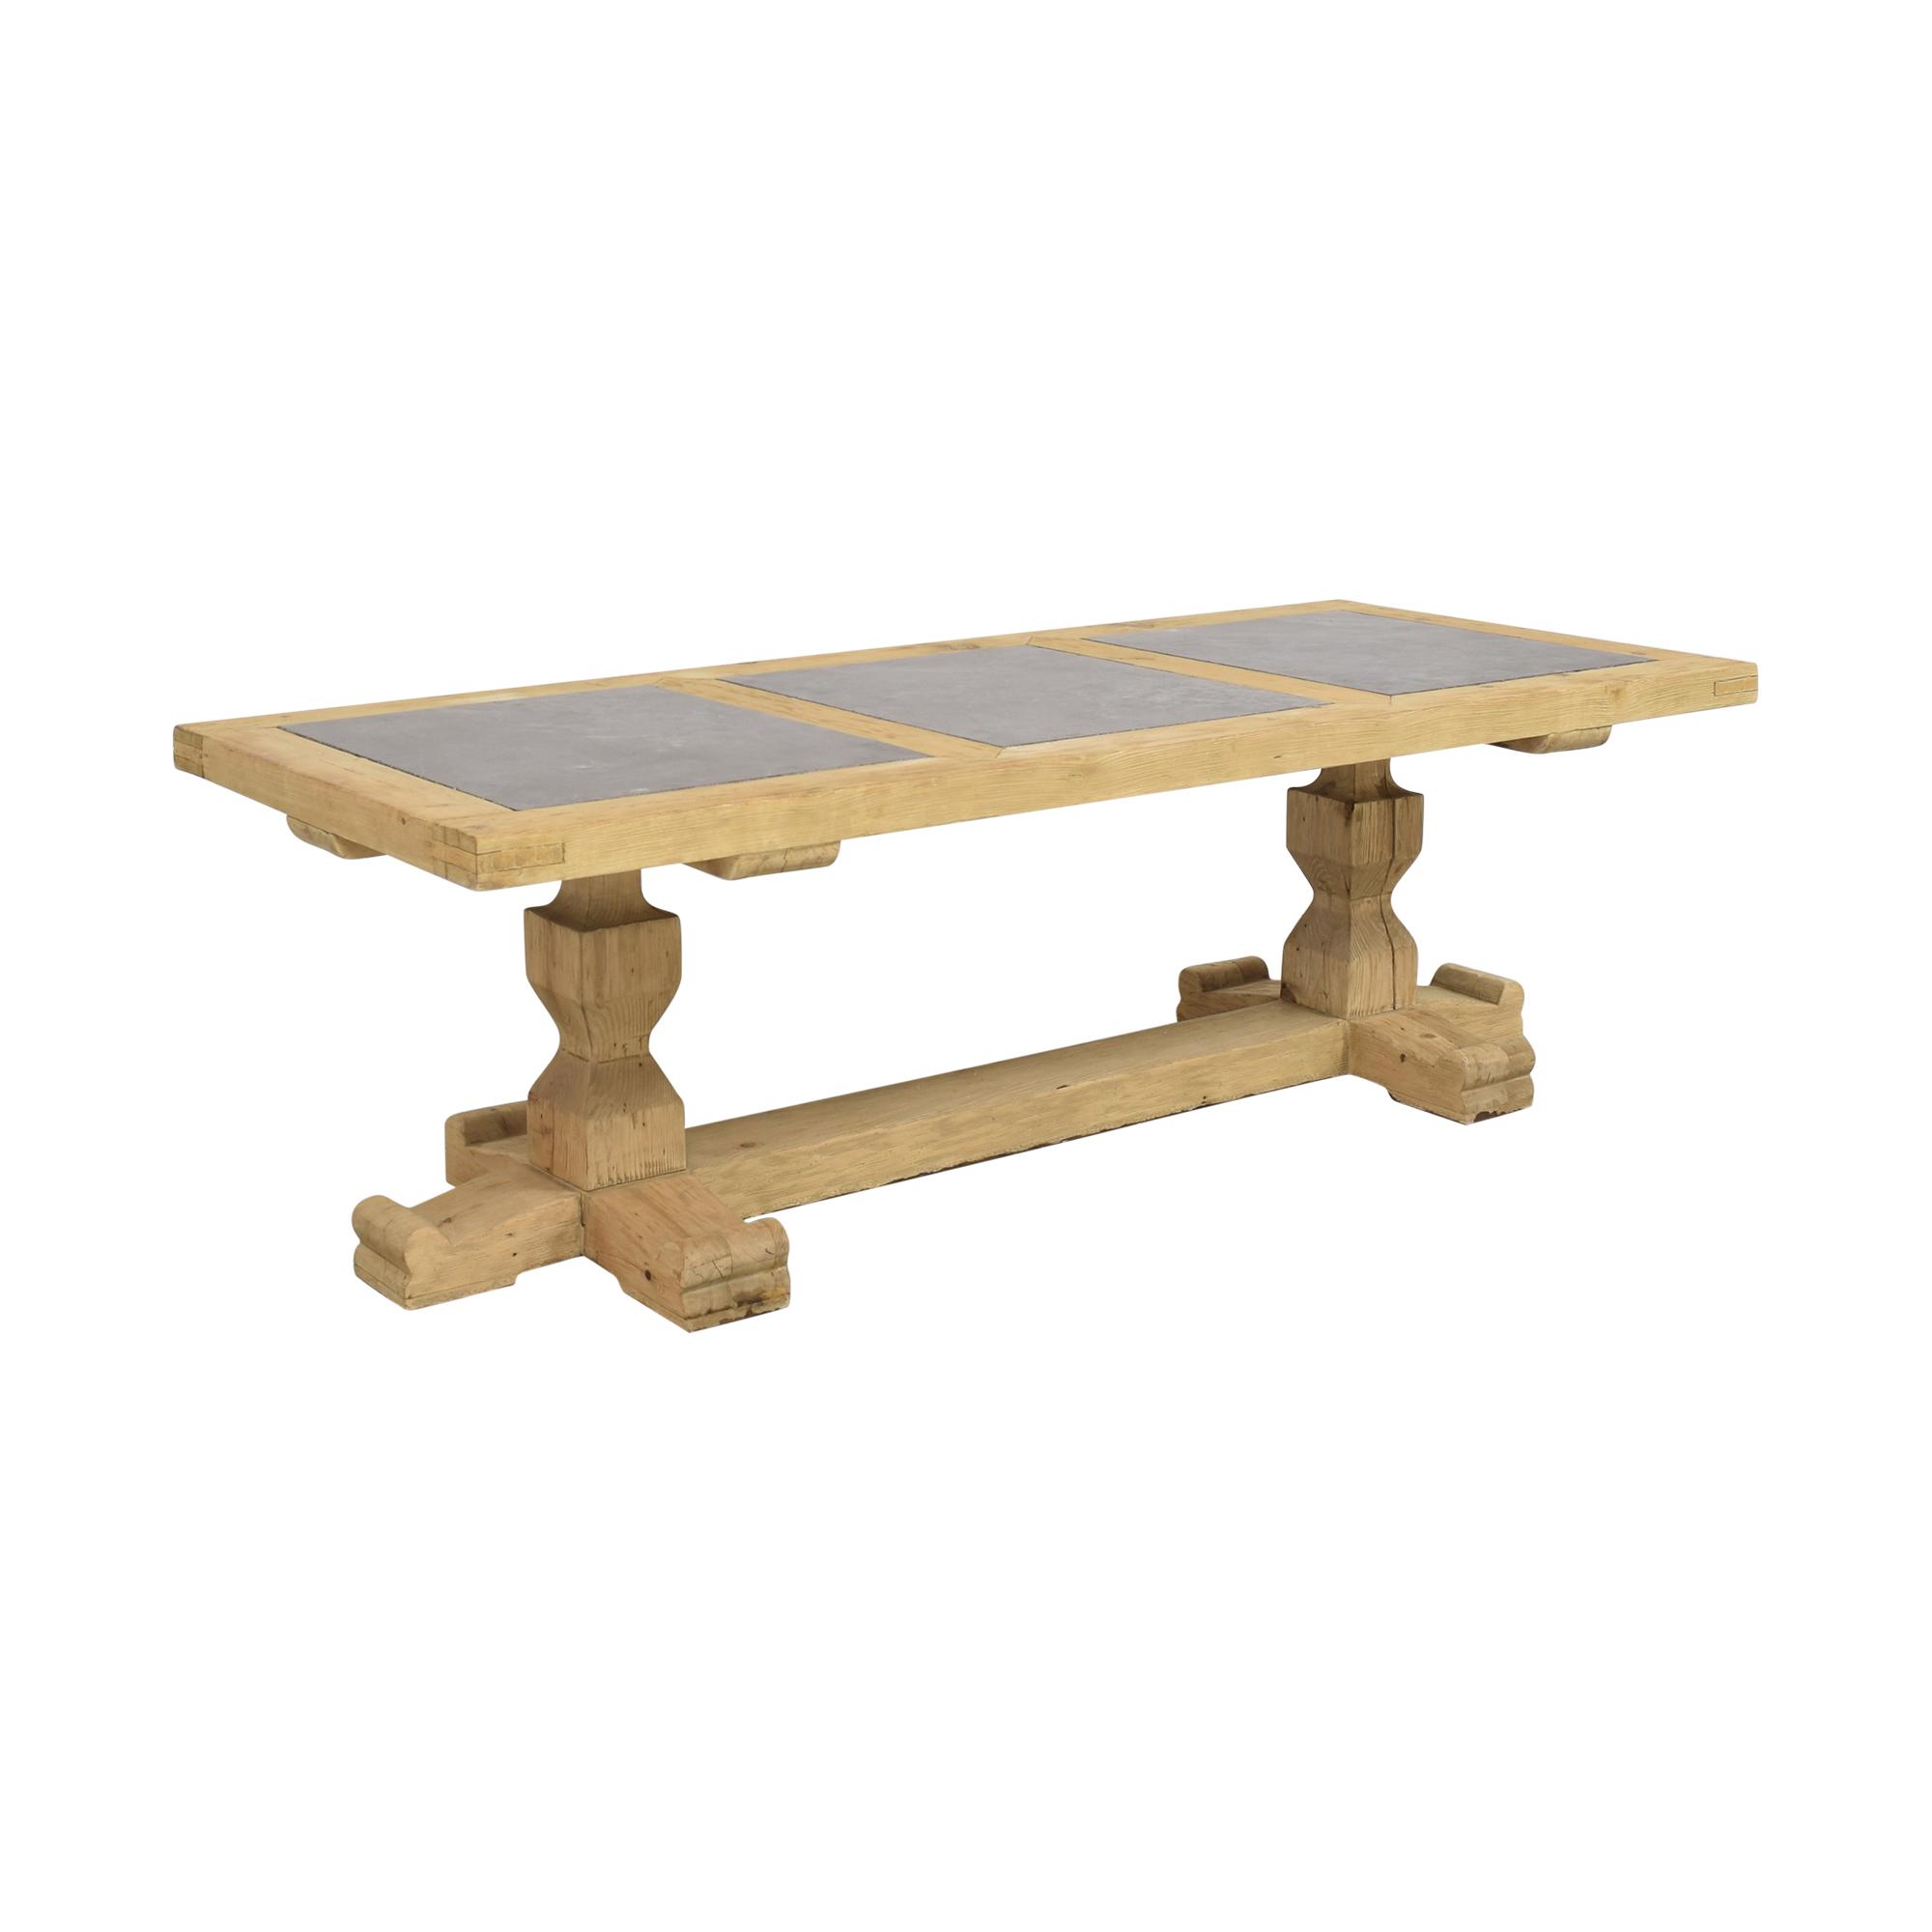 shop Restoration Hardware 18th C. Reclaimed Pine & Bluestone Rectangular Dining Table Restoration Hardware Dinner Tables